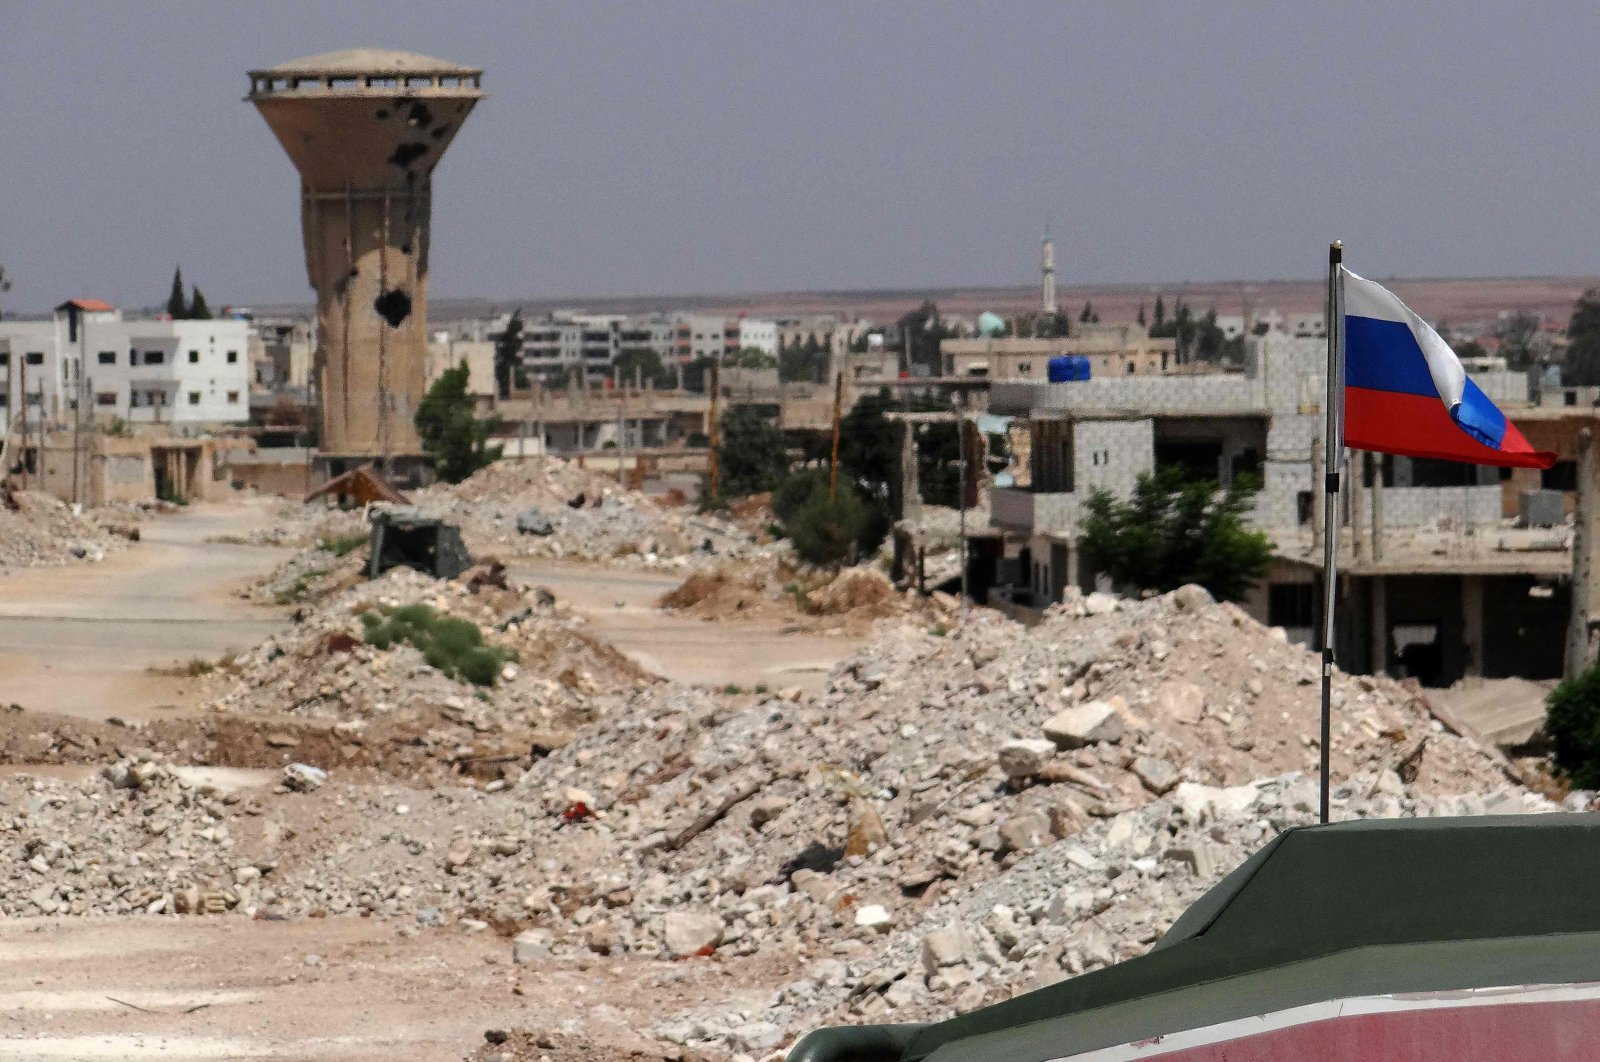 Assad Regime Escalates Attacks on Daraa Despite Truce